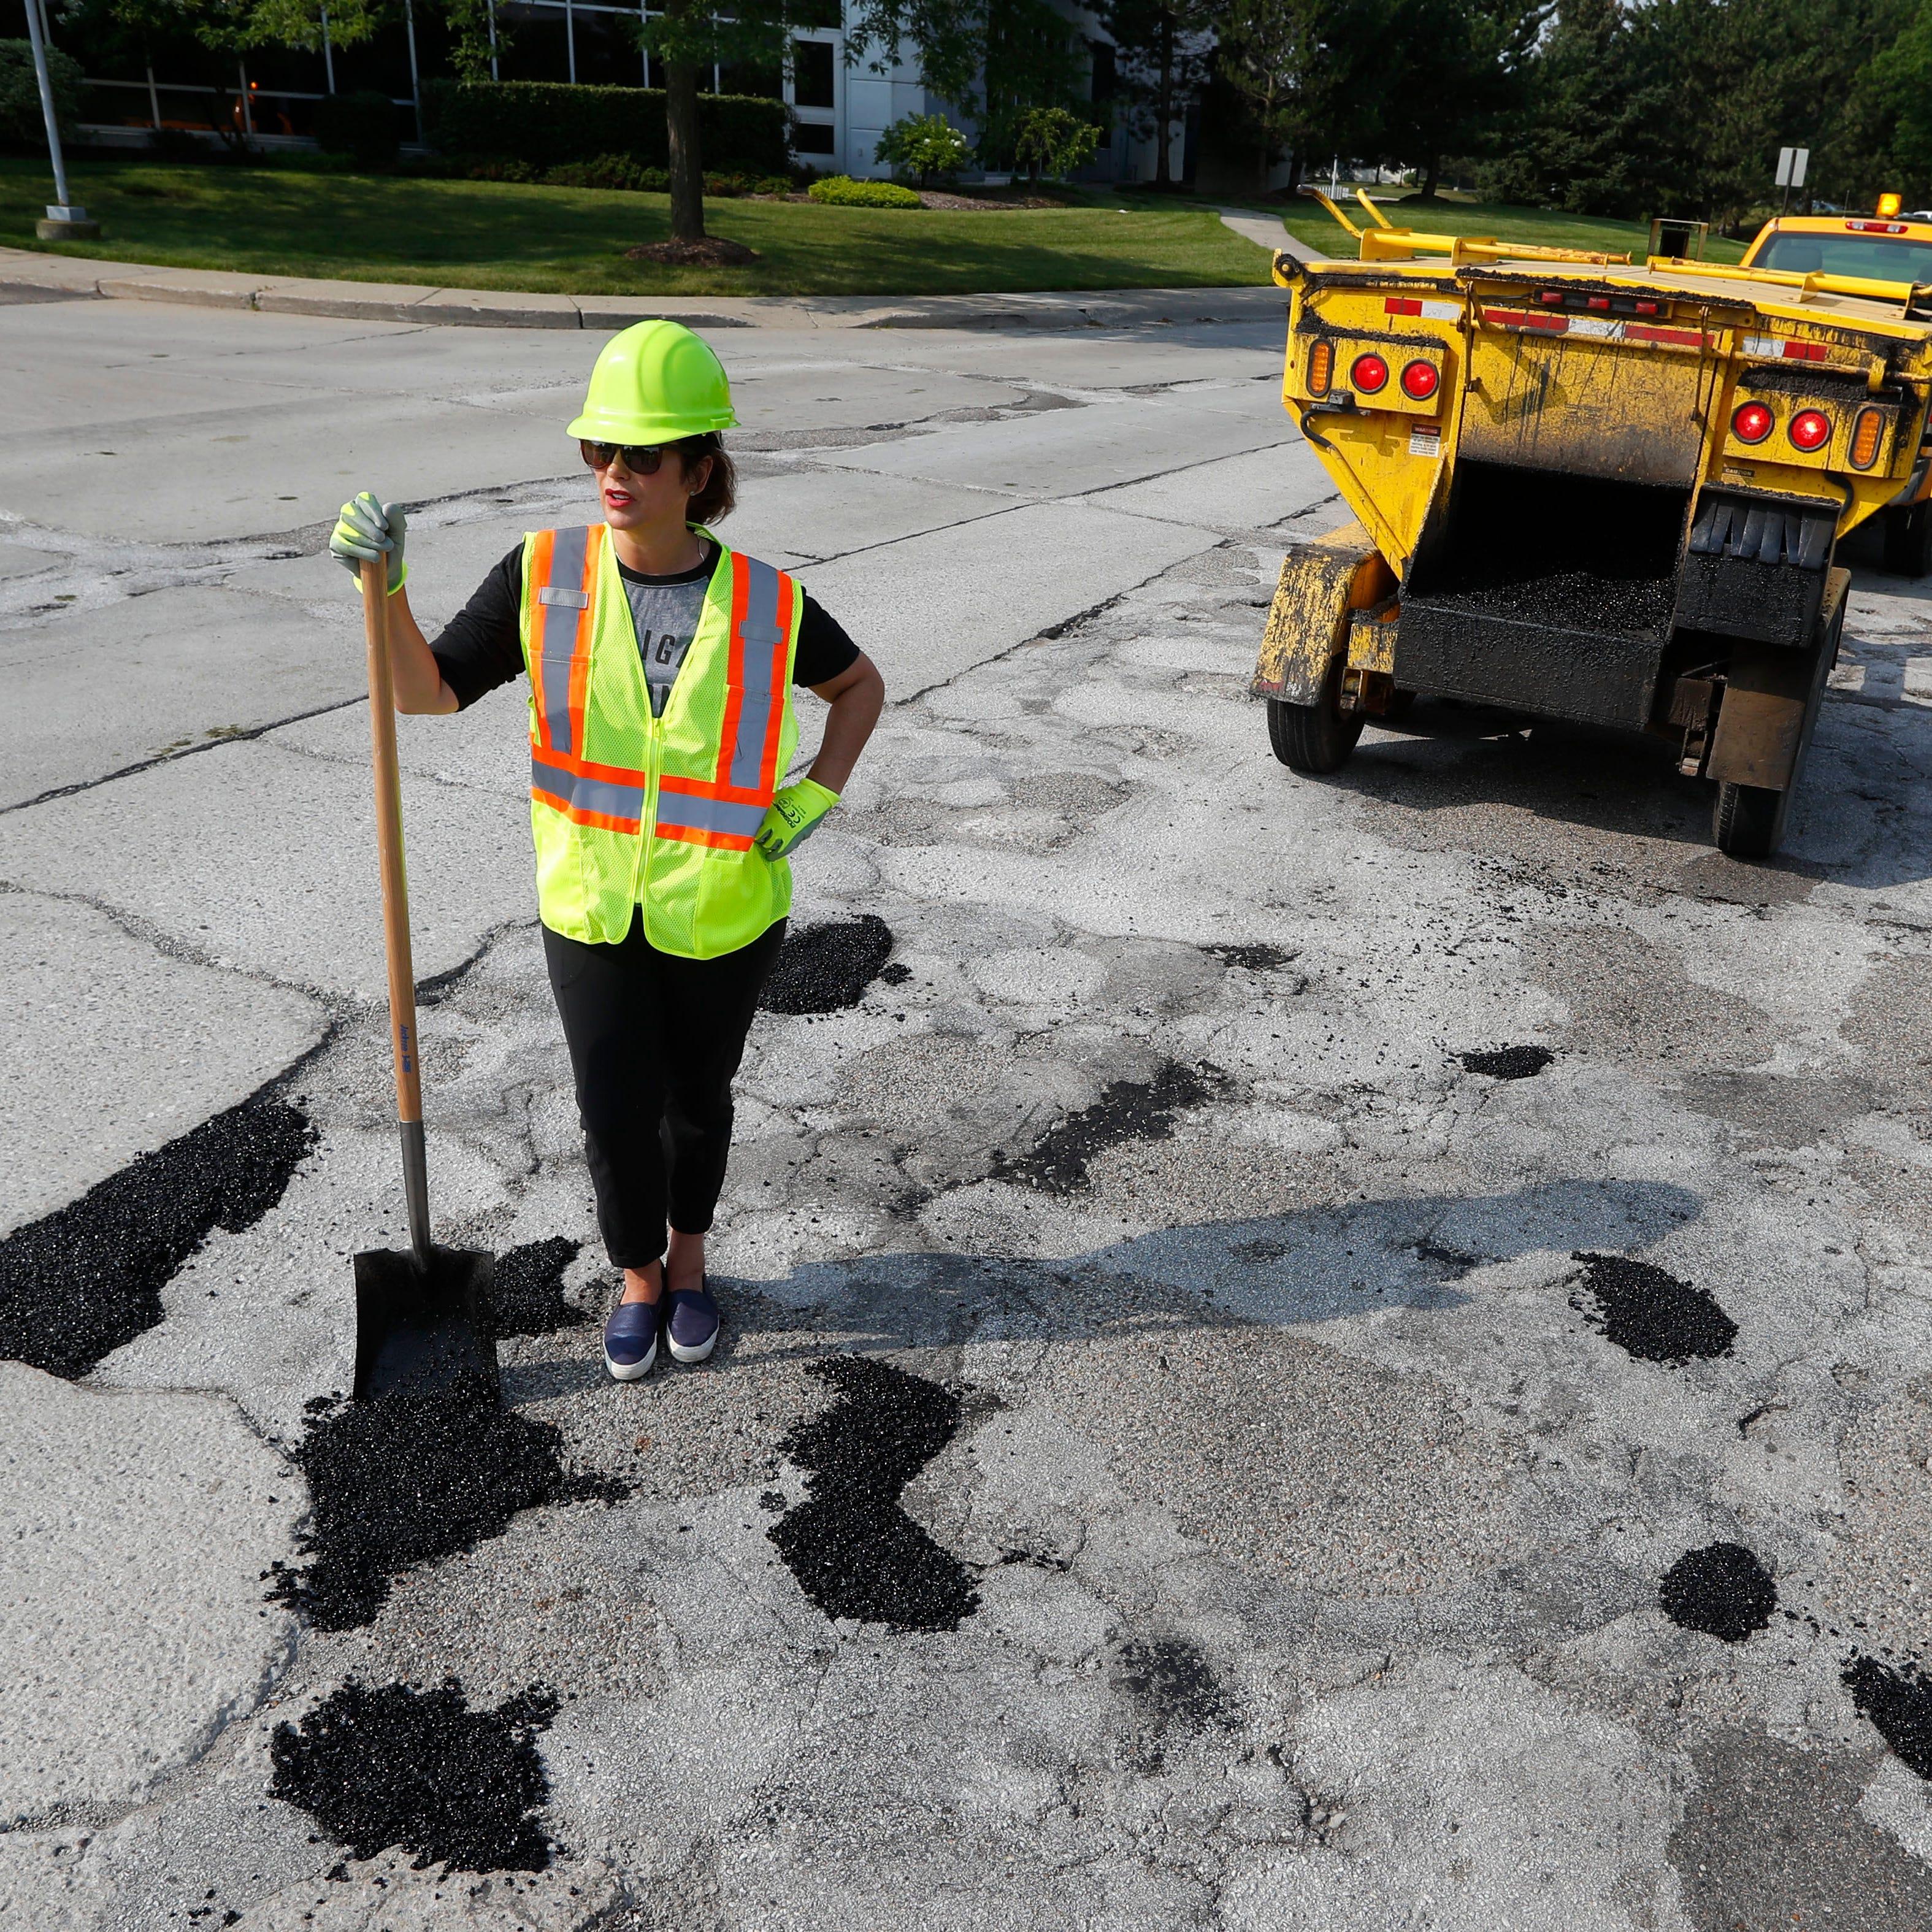 Opinion: Road funding needs fundamental fix